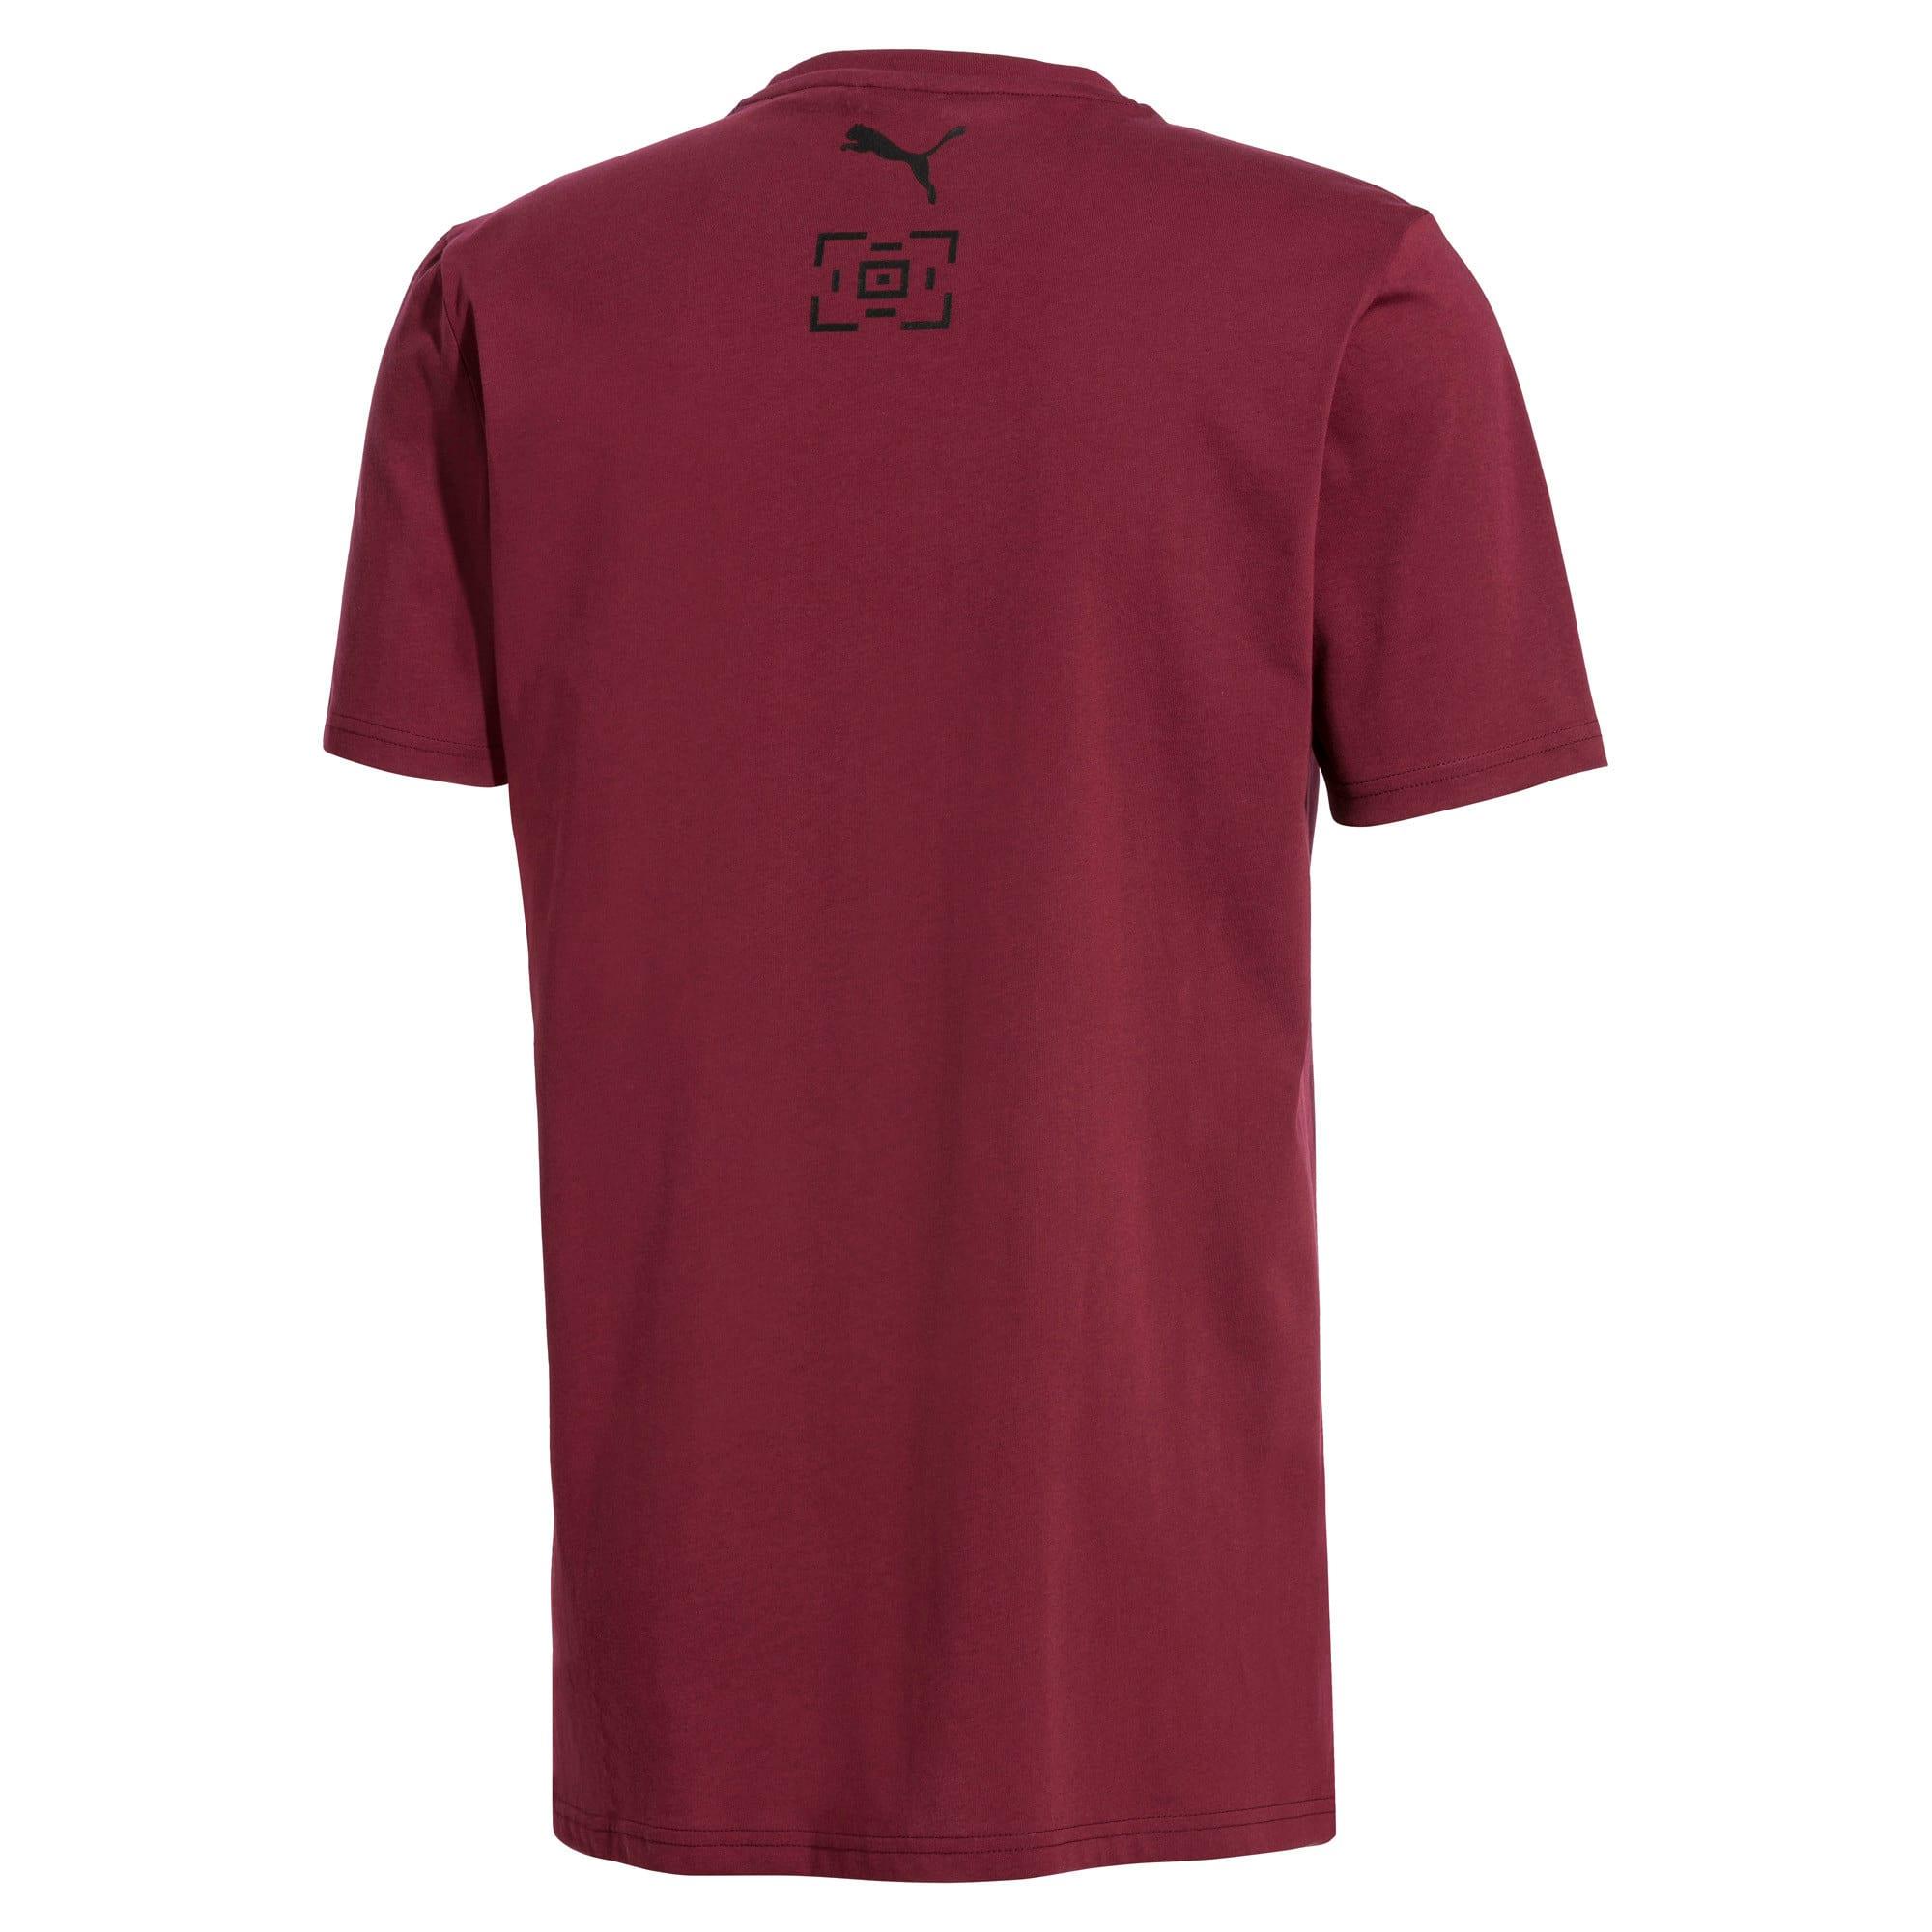 Thumbnail 3 of T-Shirt PUMA x LES BENJAMINS pour homme, Burgundy, medium